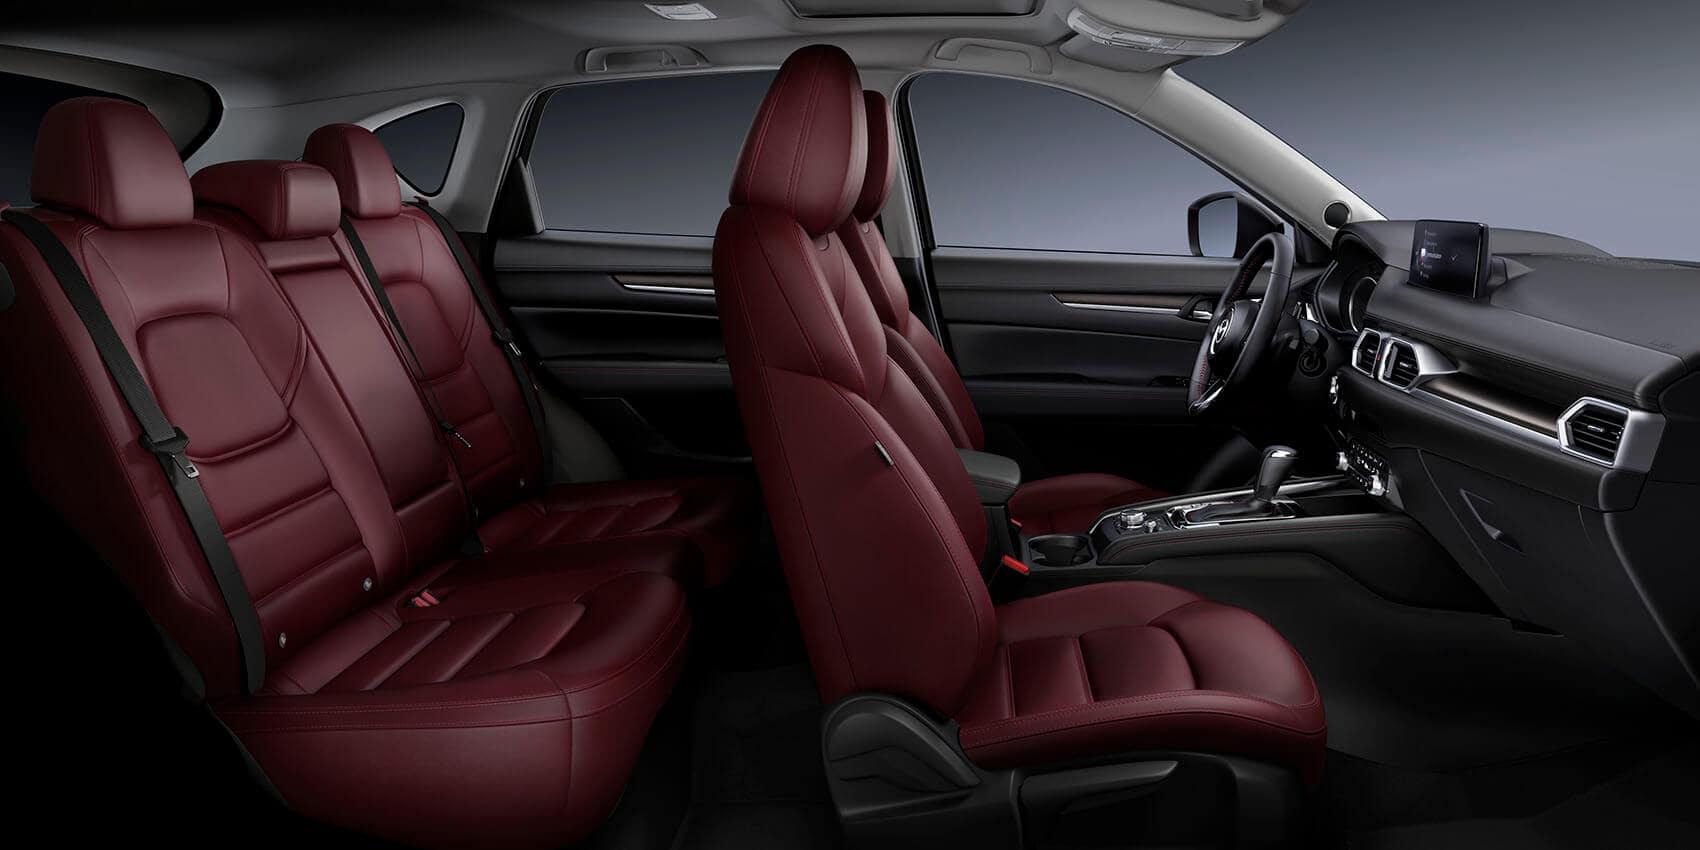 Mazda CX-5 Cabin Space